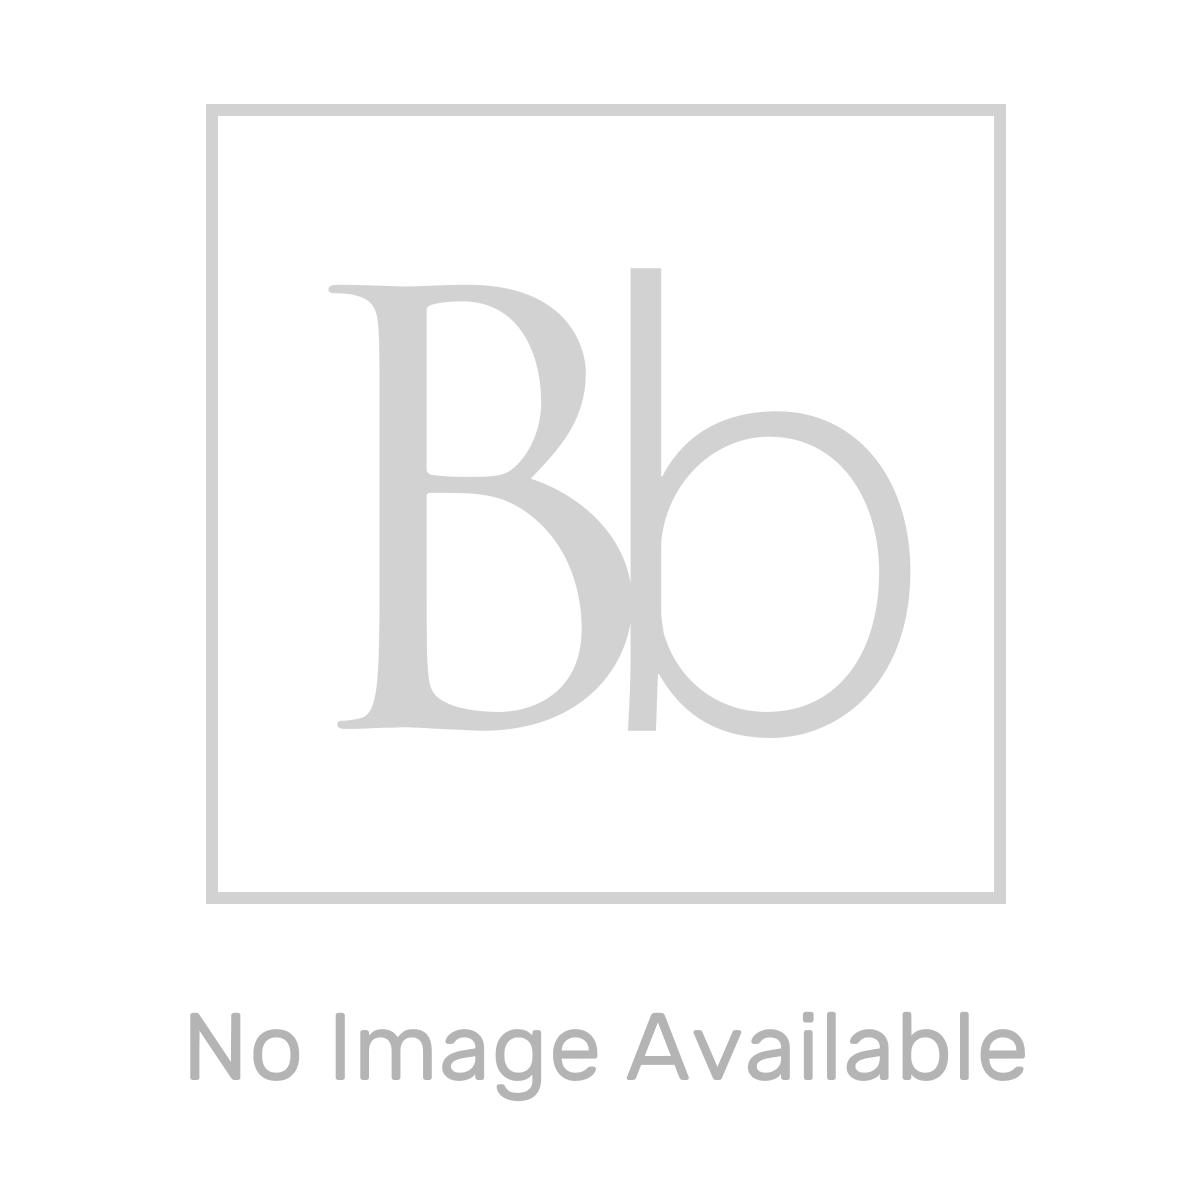 RAK Feeling Black Rectangular Shower Tray 1700 x 700mm Measurements